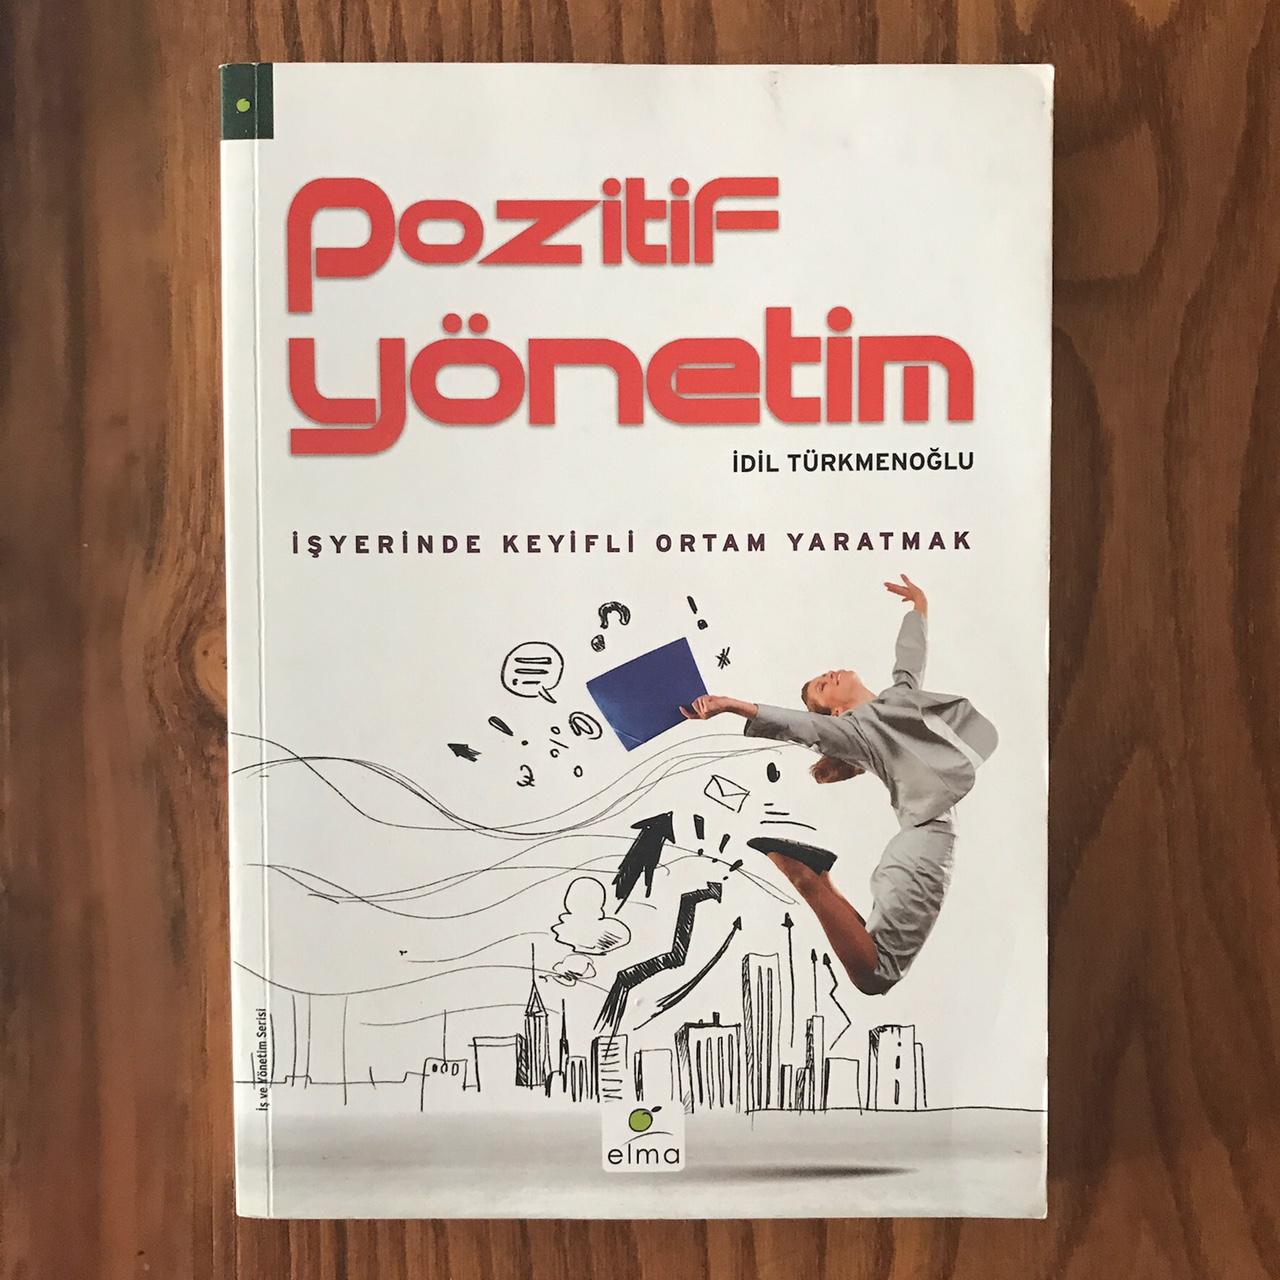 Pozitif Yonetim - Isyerinde Keyifli Ortam Yaratmak